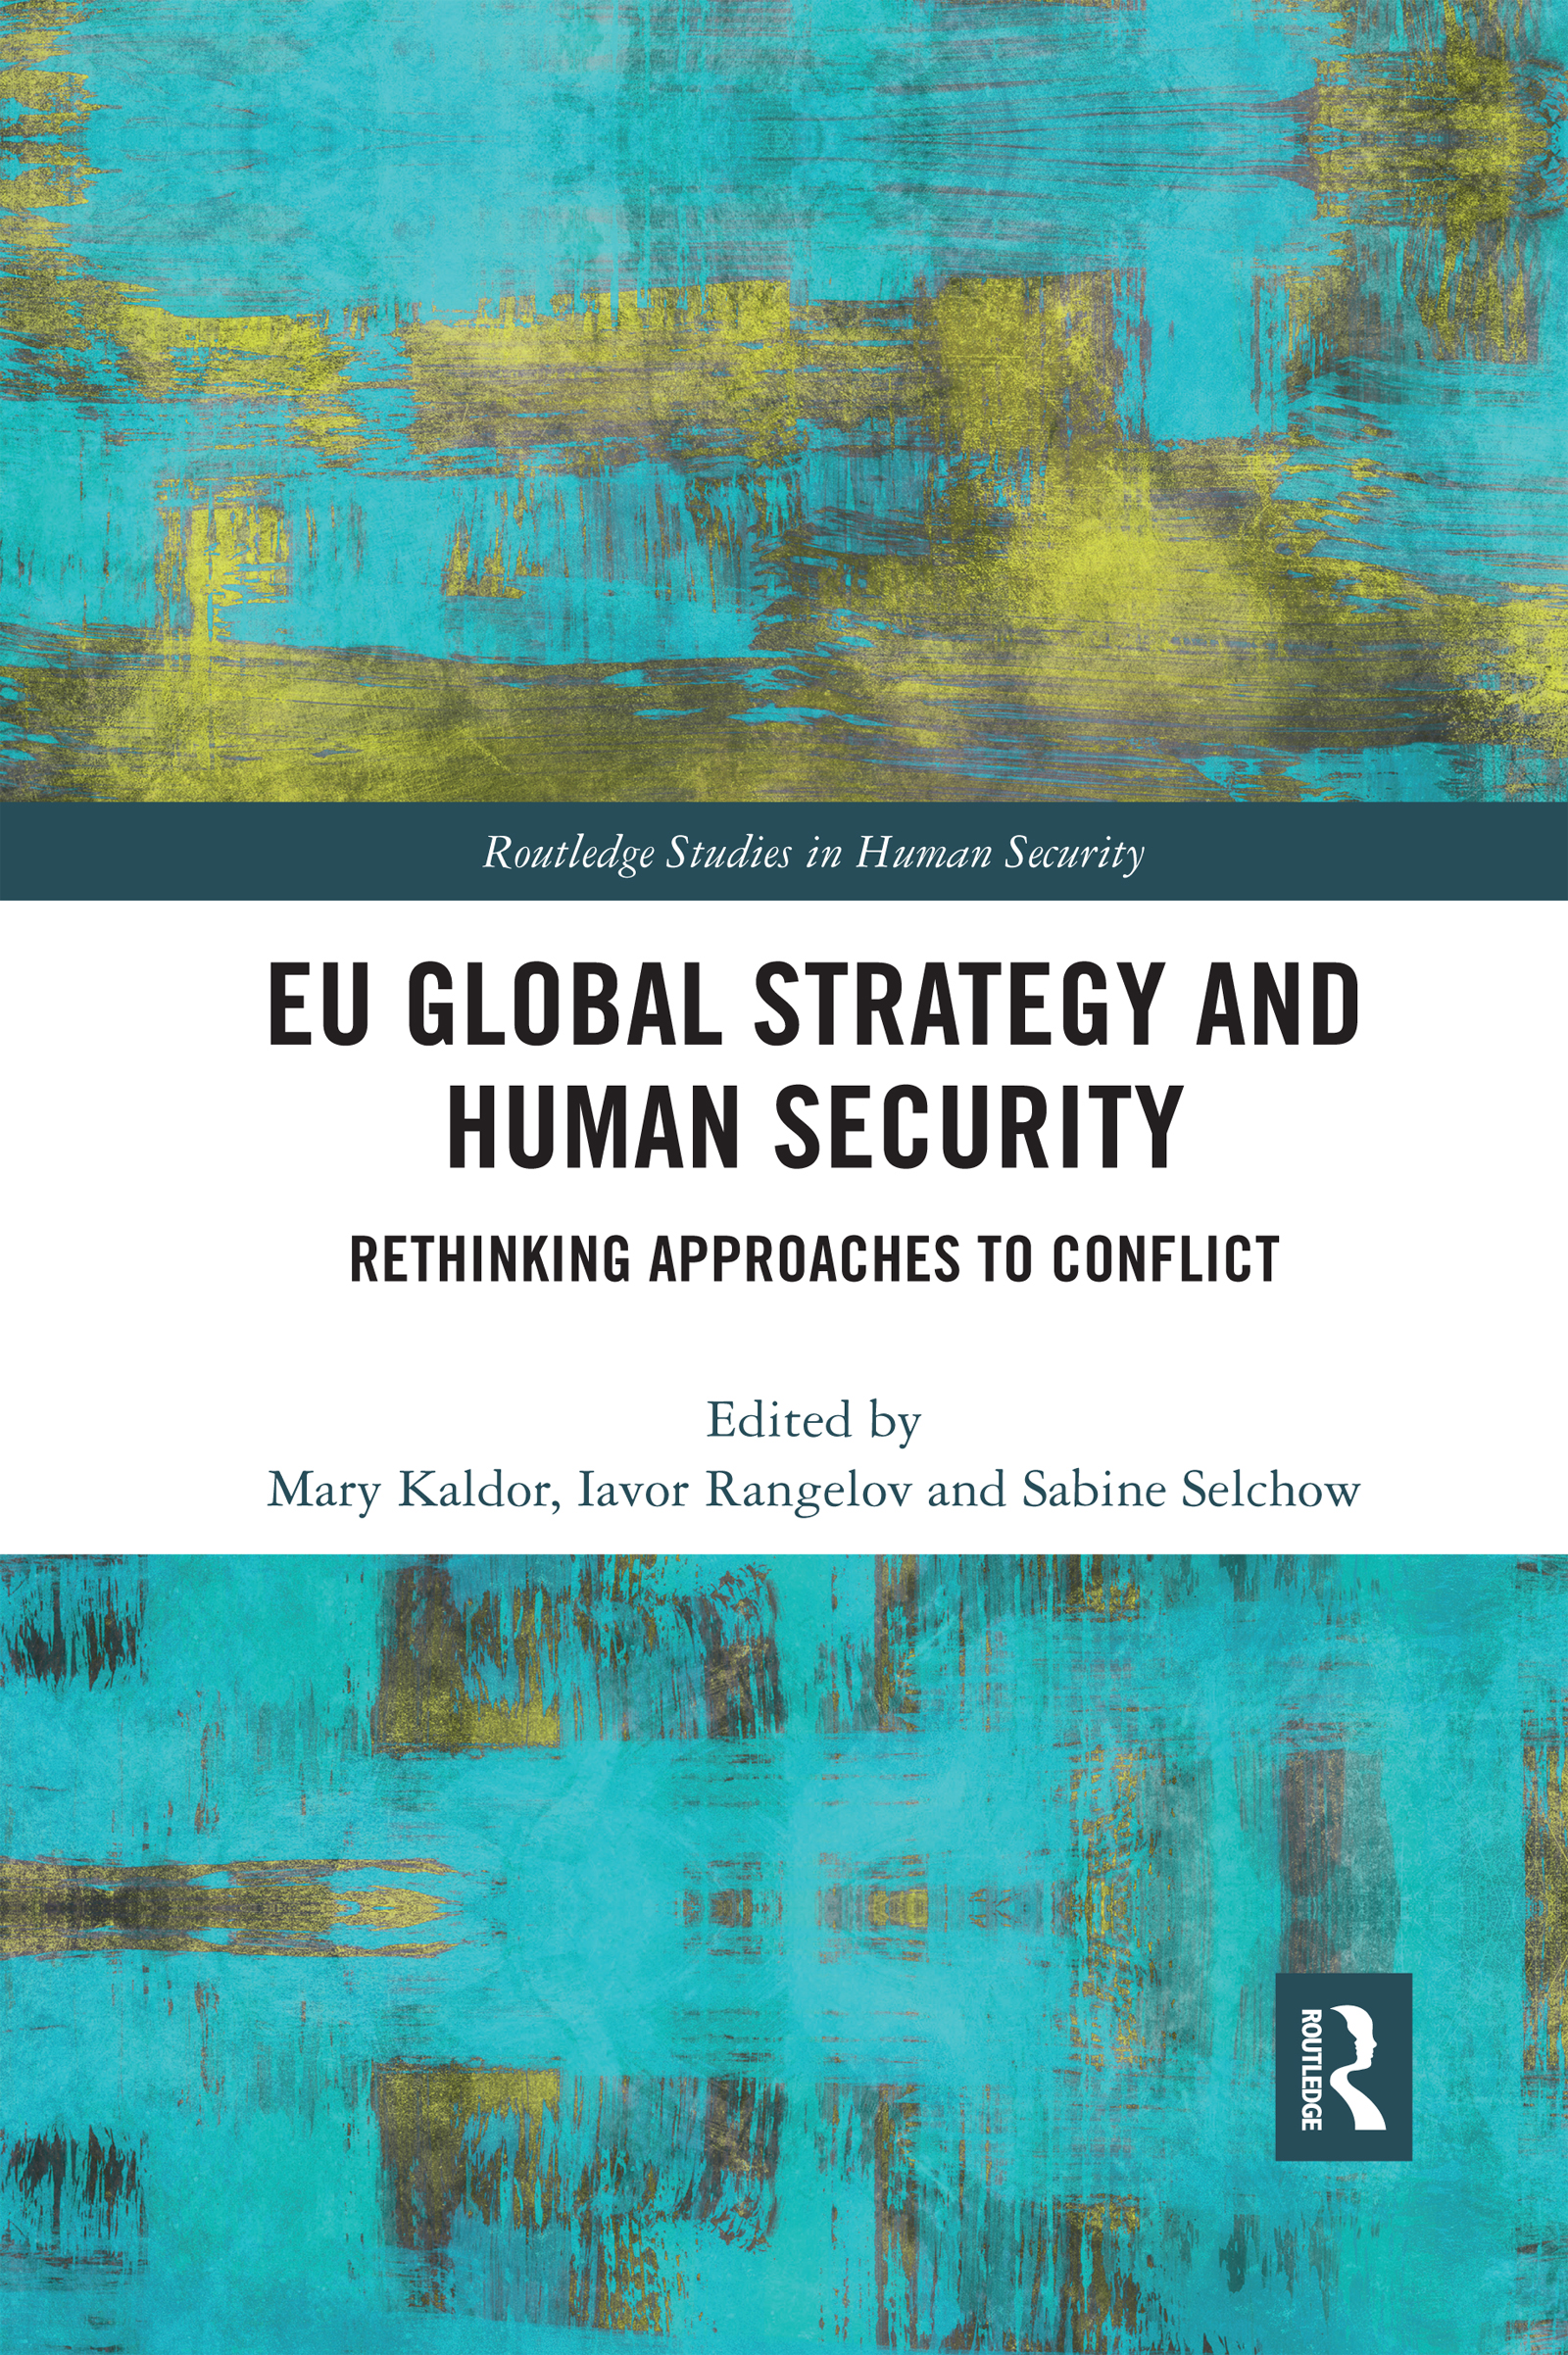 EU Global Strategy and Human Security